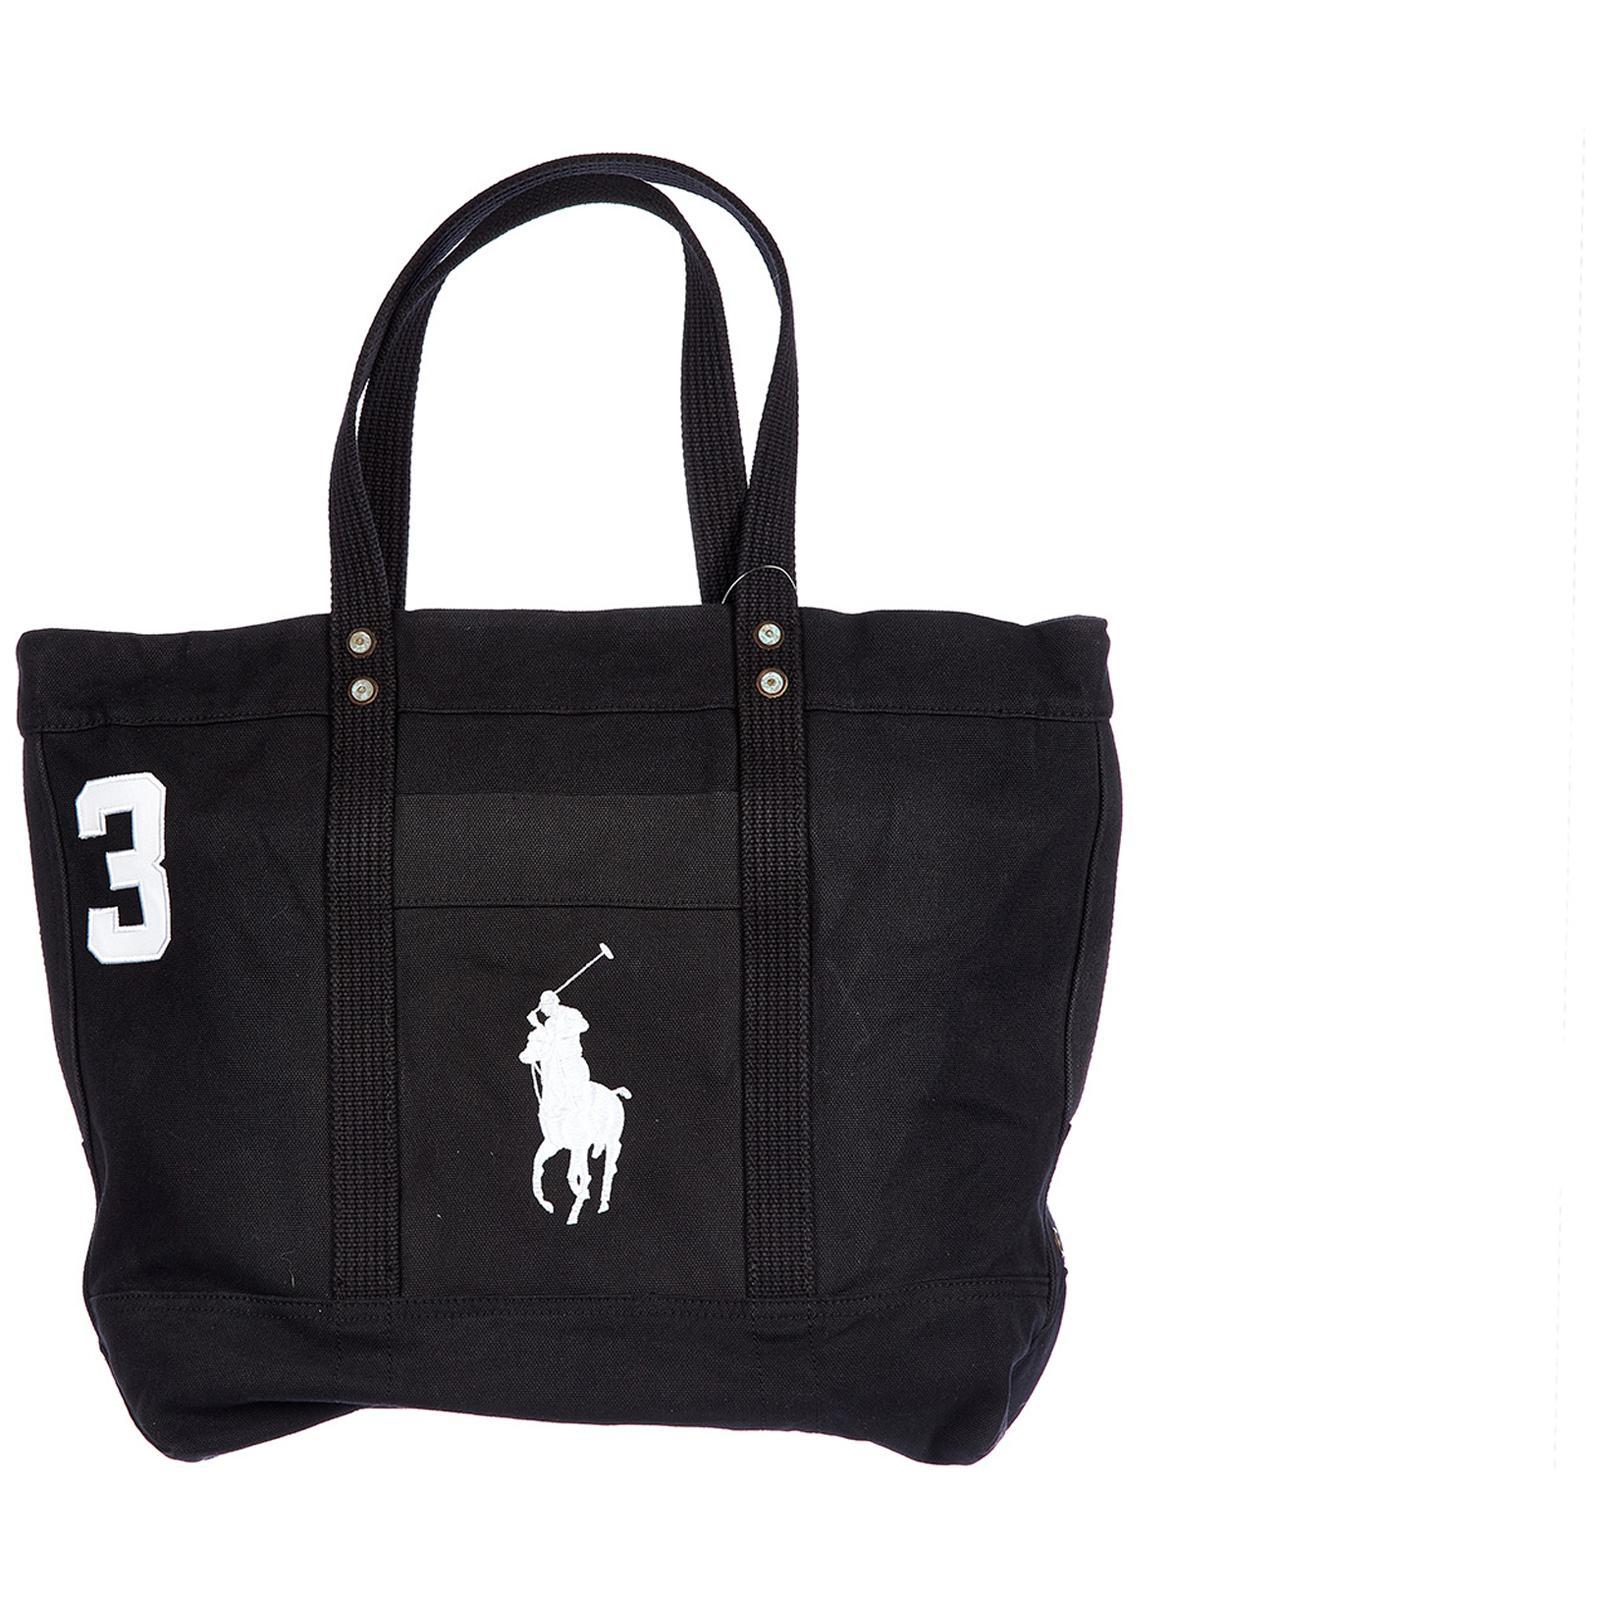 d23cc79be754 Polo Ralph Lauren Bag Handbag Shopping Tote Canvas in Black for Men ...